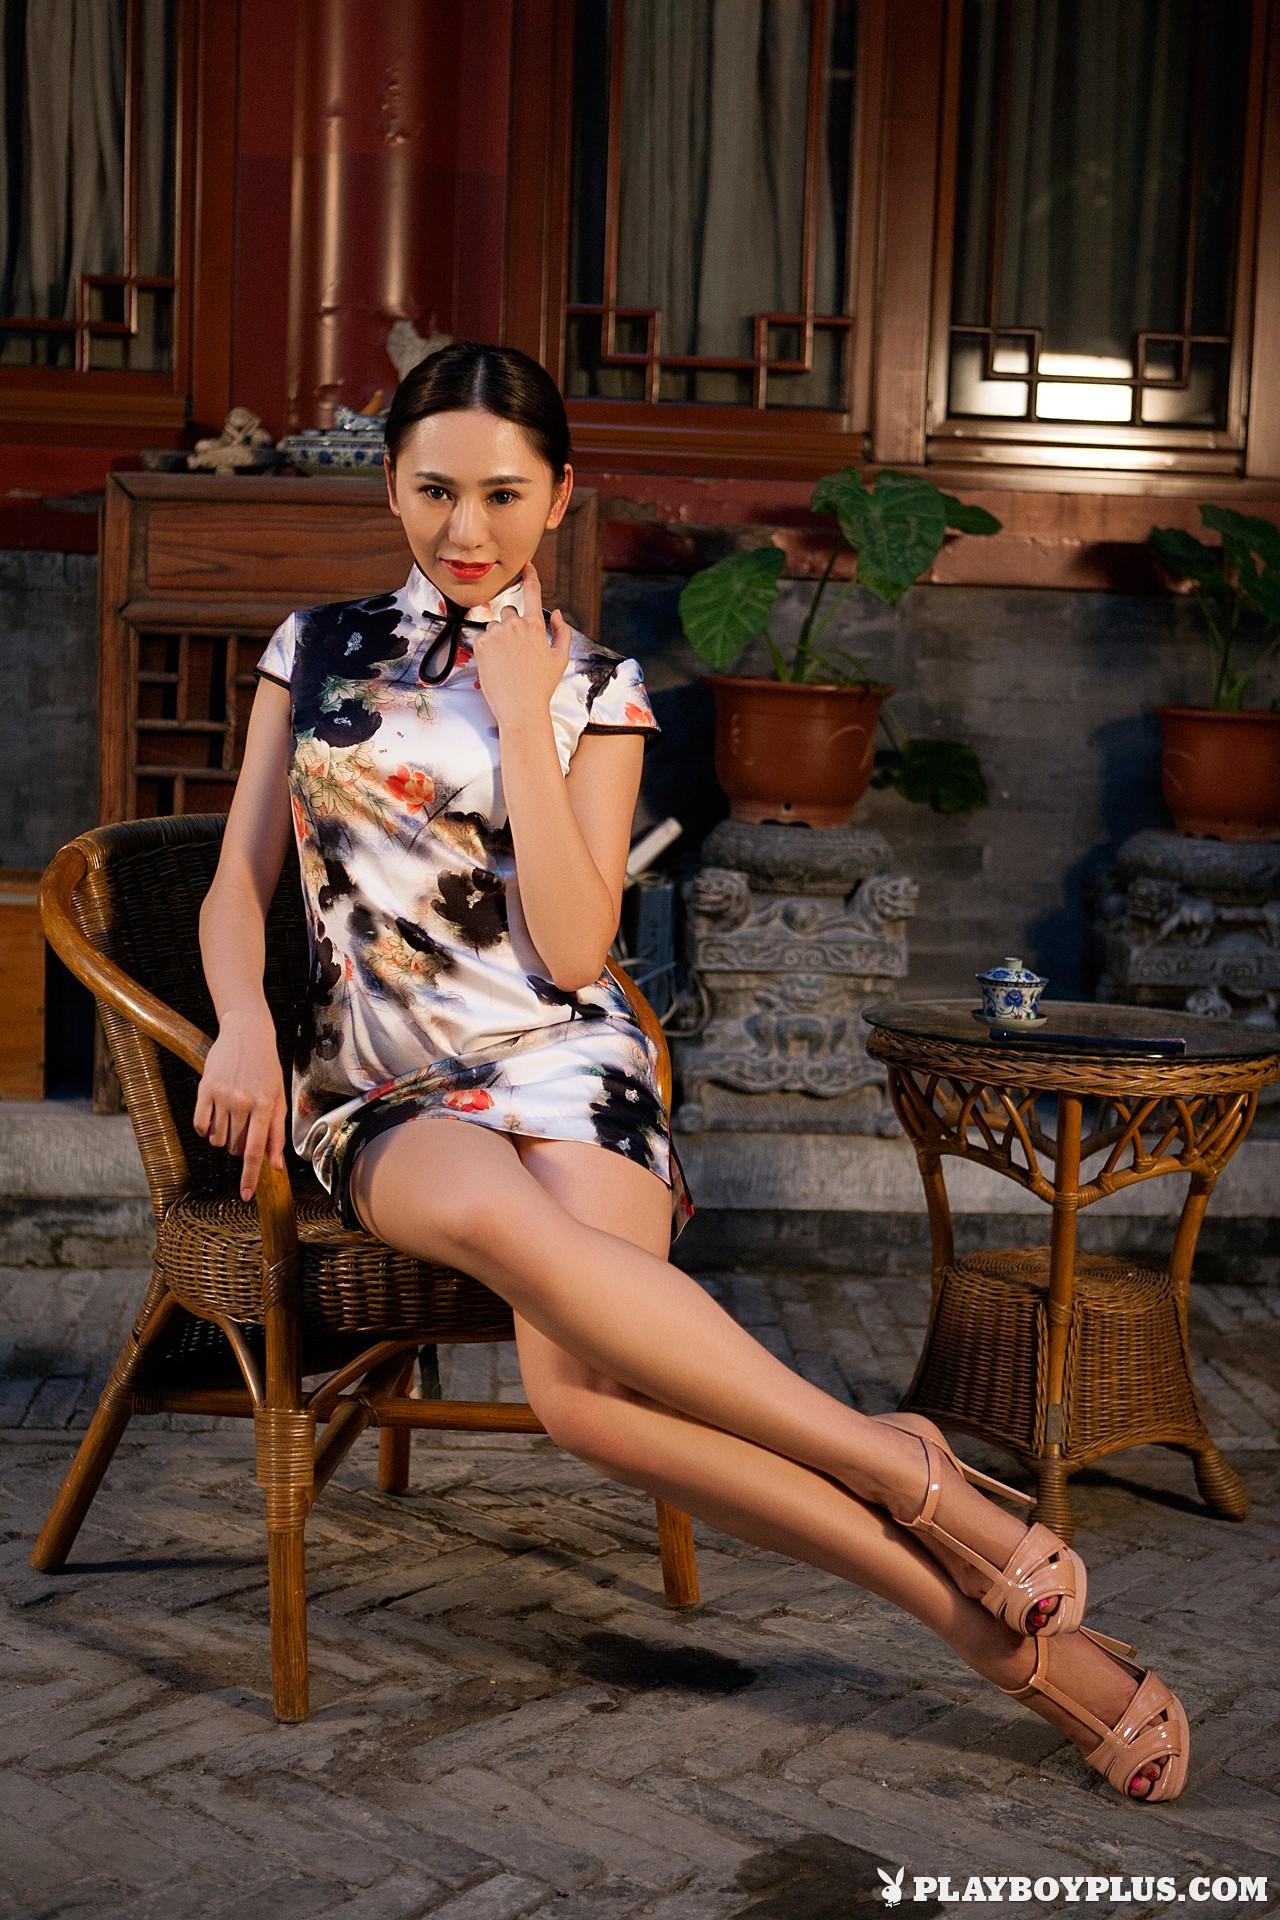 Wallpaper  1280X1920 Px, Chinese, Women, Wu Muxi 1280X1920 - Goodfon - 1040954 - Hd -1833